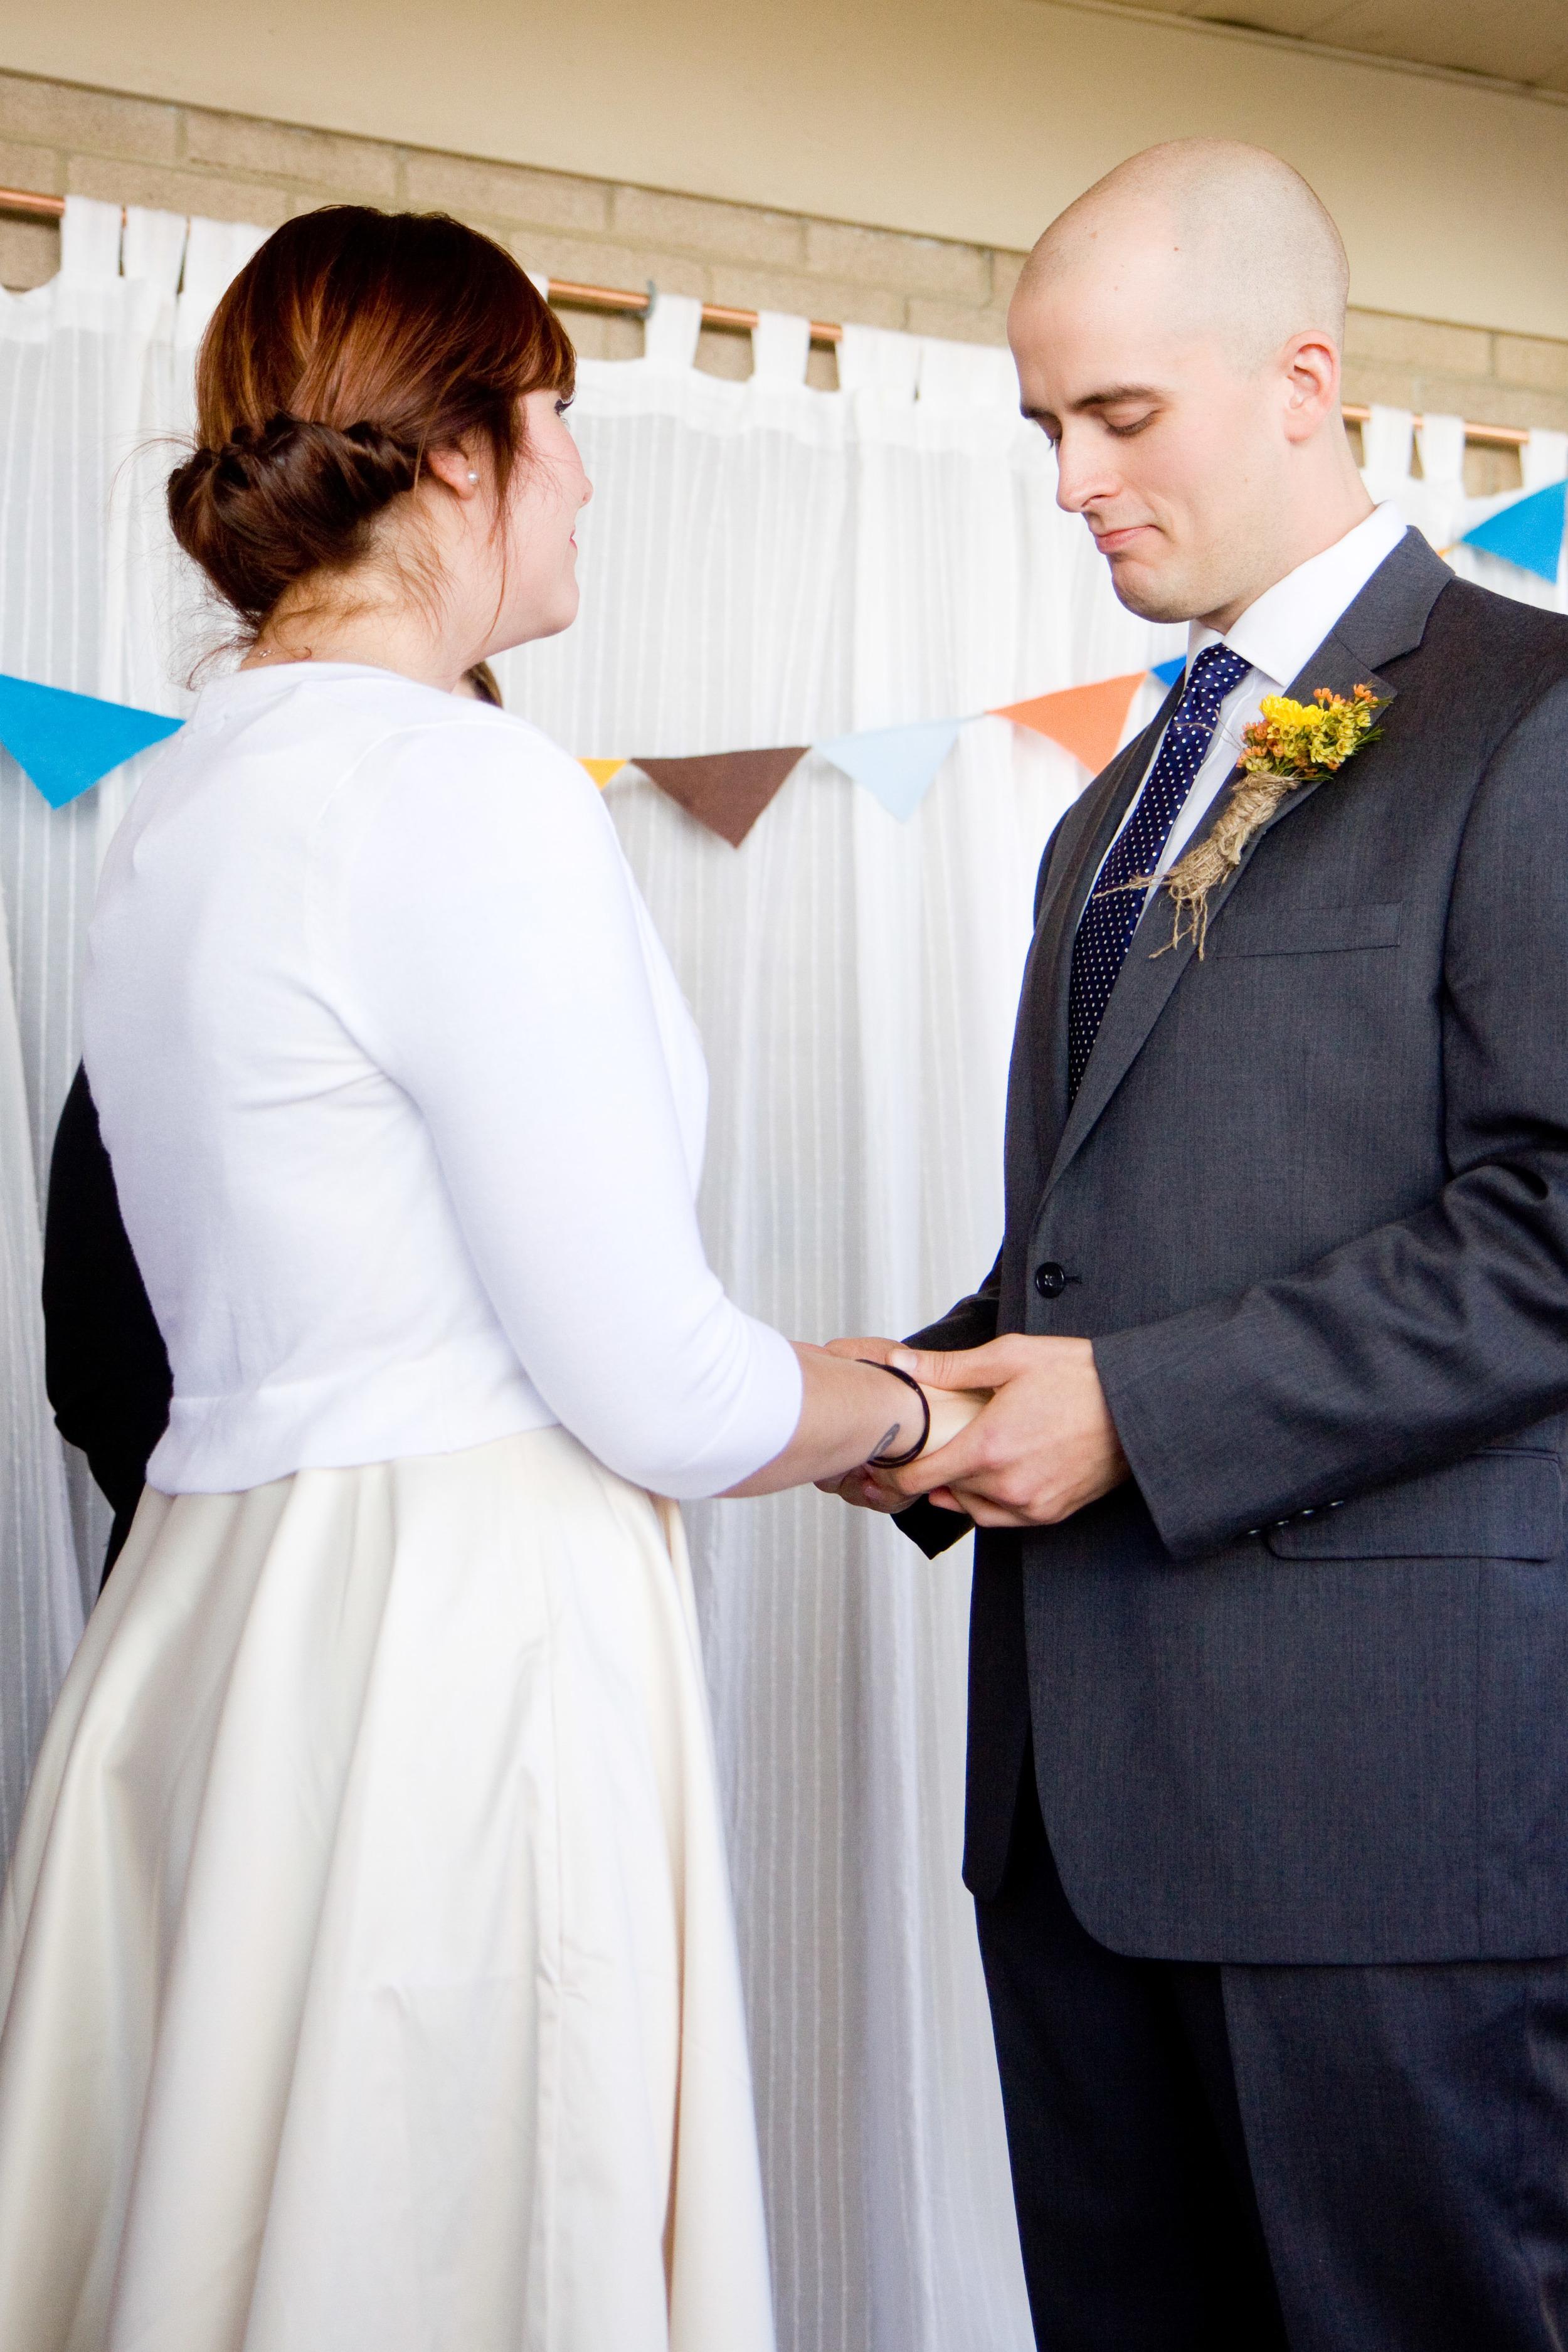 Wilson Bickel Wedding - Reception and Ceremony (109 of 526).jpg